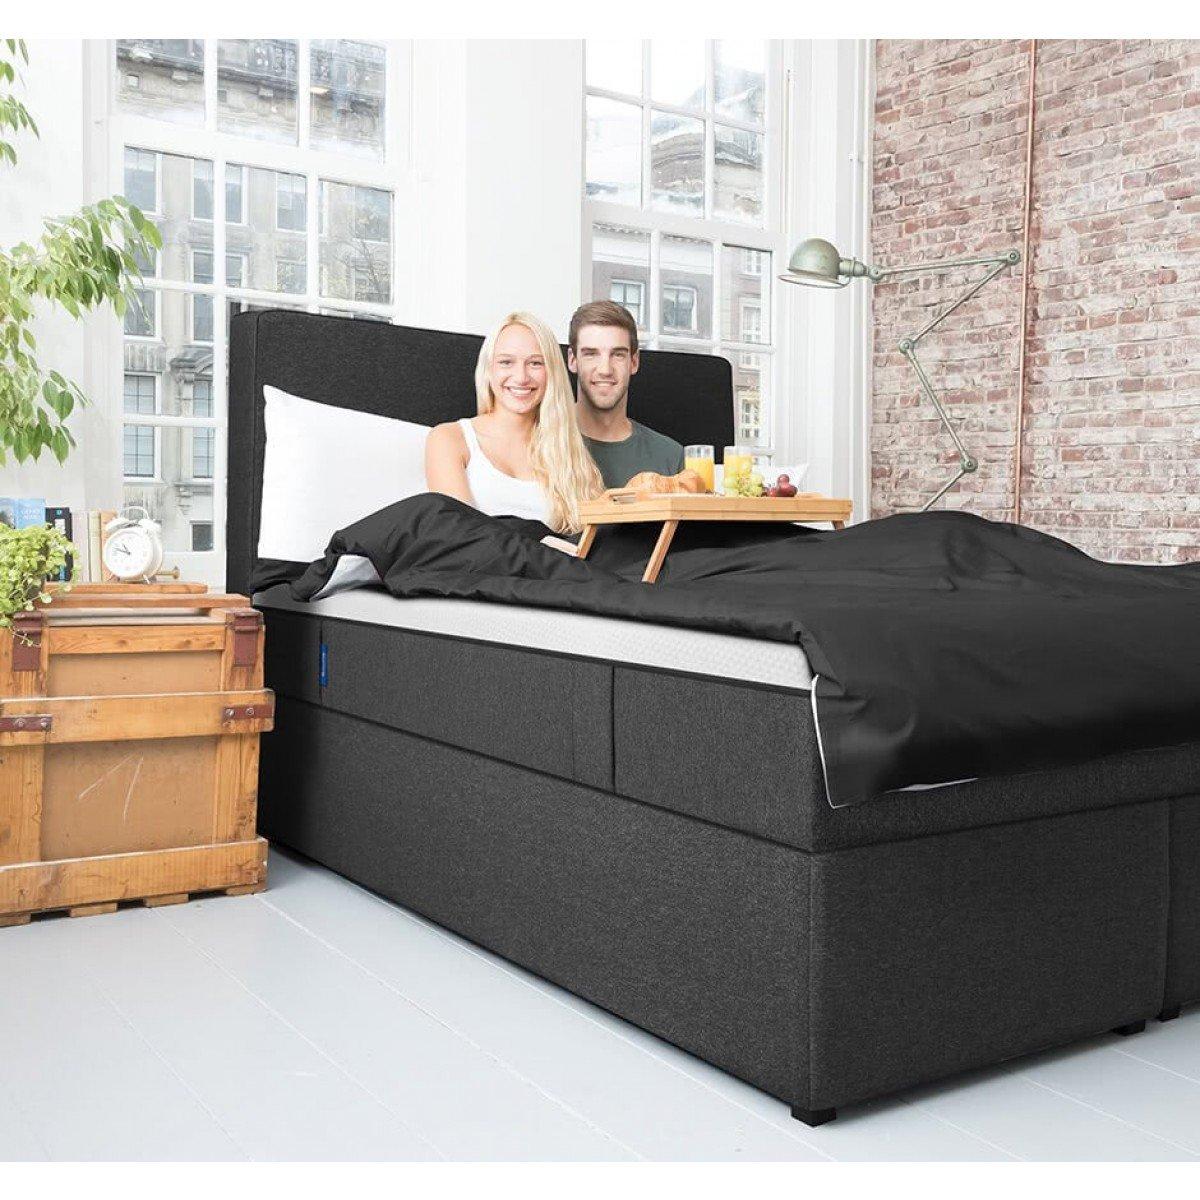 Boxspringbett super bequem Schlafzimmer